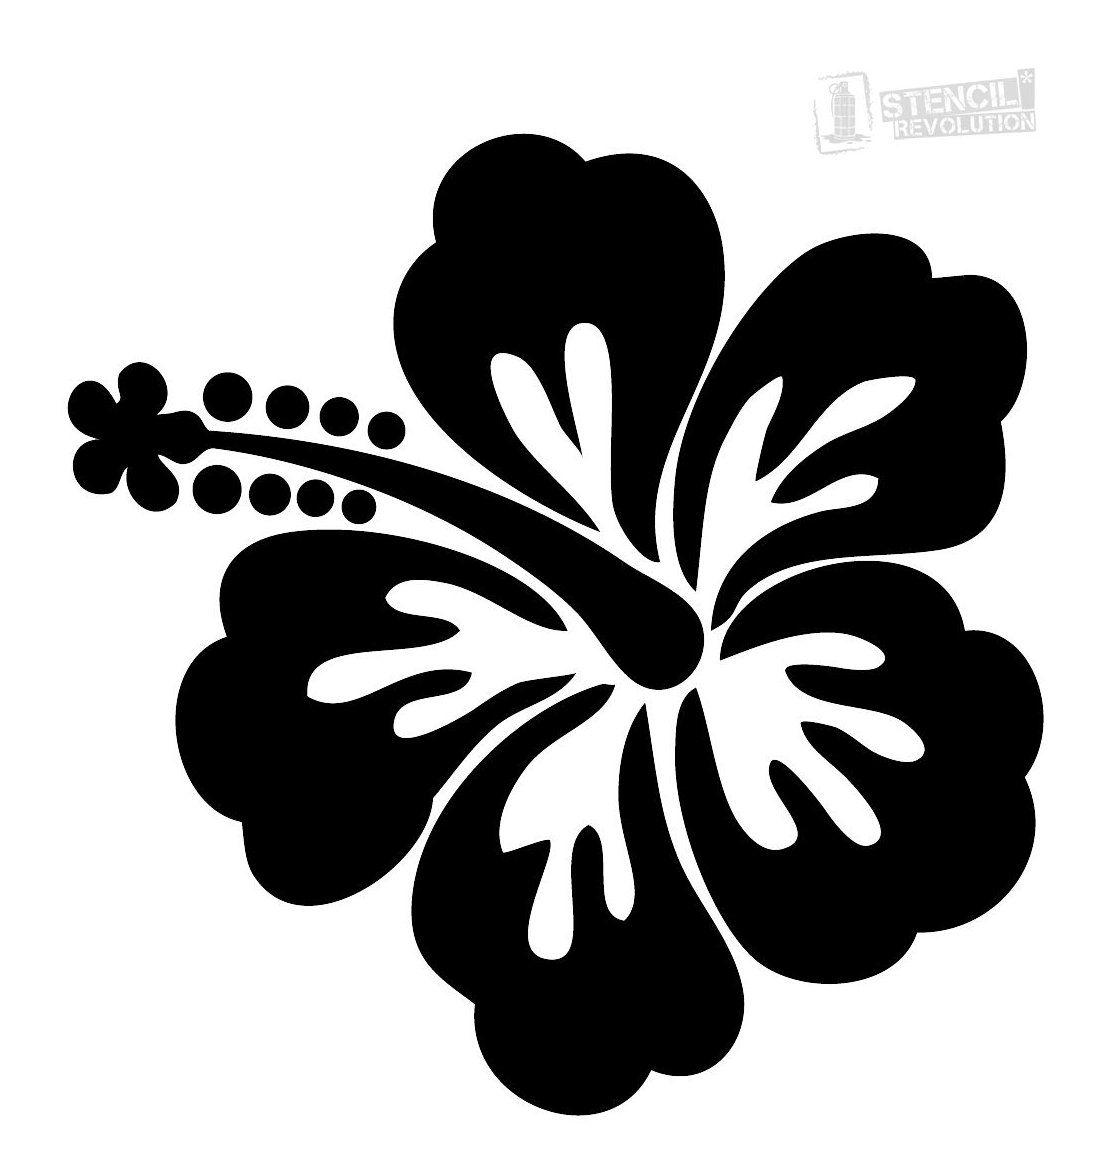 Hibiscus Flower Stencil Stencil Art Flowers Stencilartflowers Hibiscus Flowers Are Stunning And A In 2020 Flower Stencil Hawaiian Flower Drawing Flower Silhouette